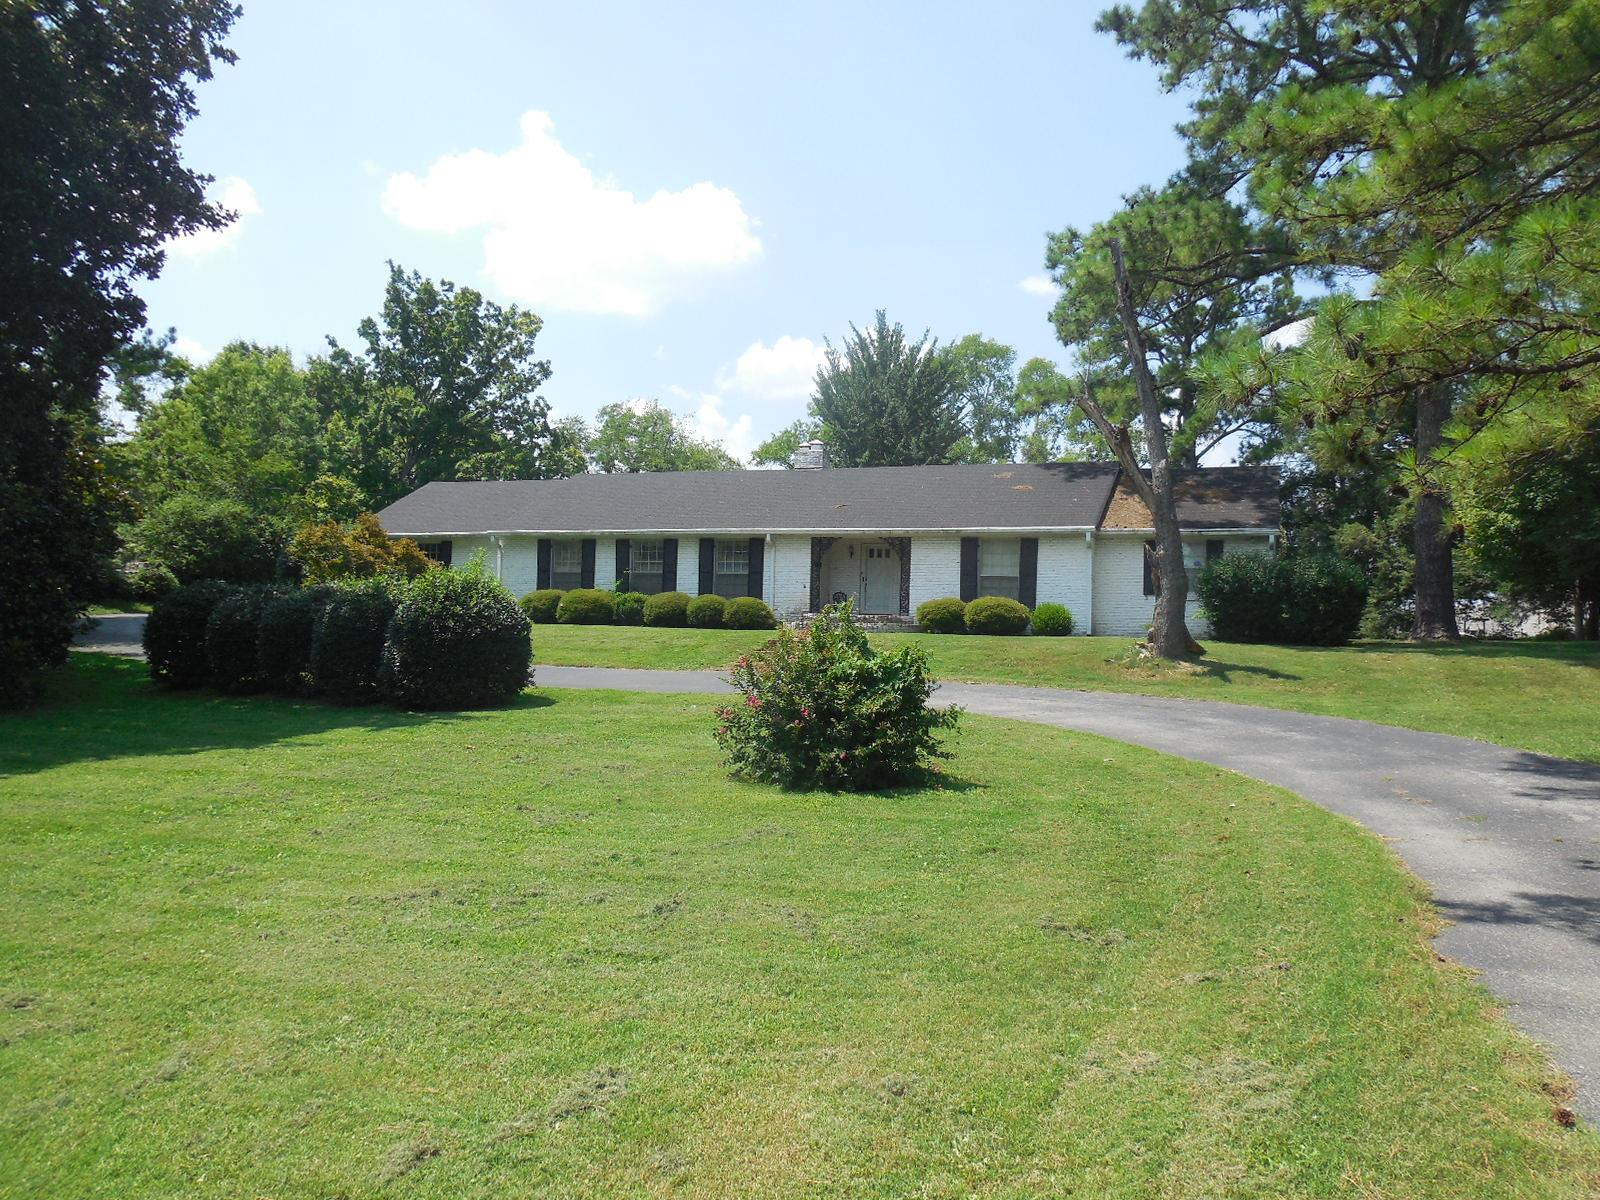 1160 Nashville Pike, Gallatin, TN 37066 - Gallatin, TN real estate listing